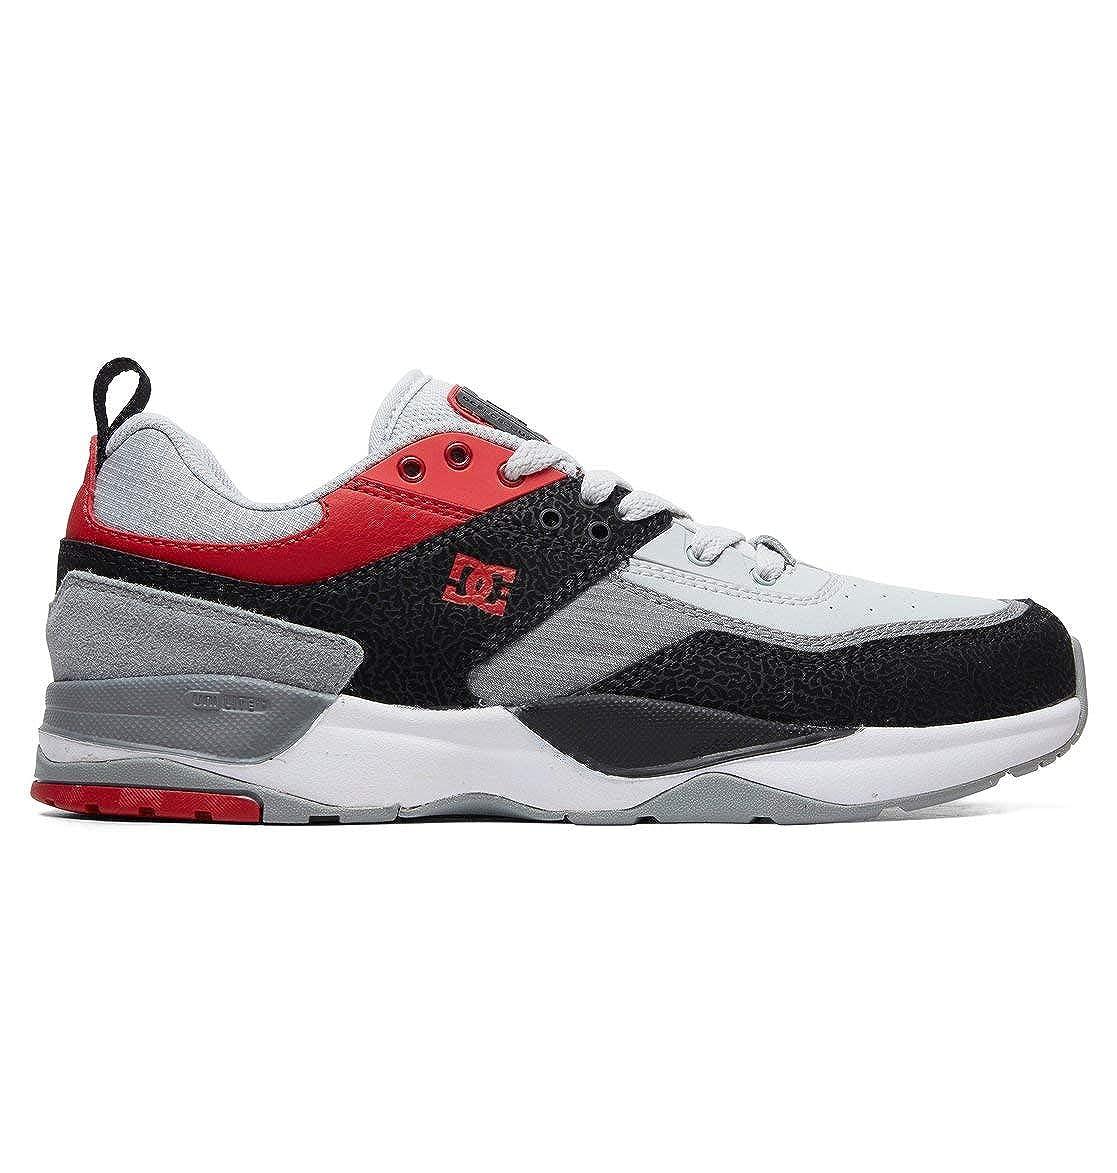 noir Athletic rouge Battleship 38 EU DC chaussures E.tribeka, E.tribeka Homme